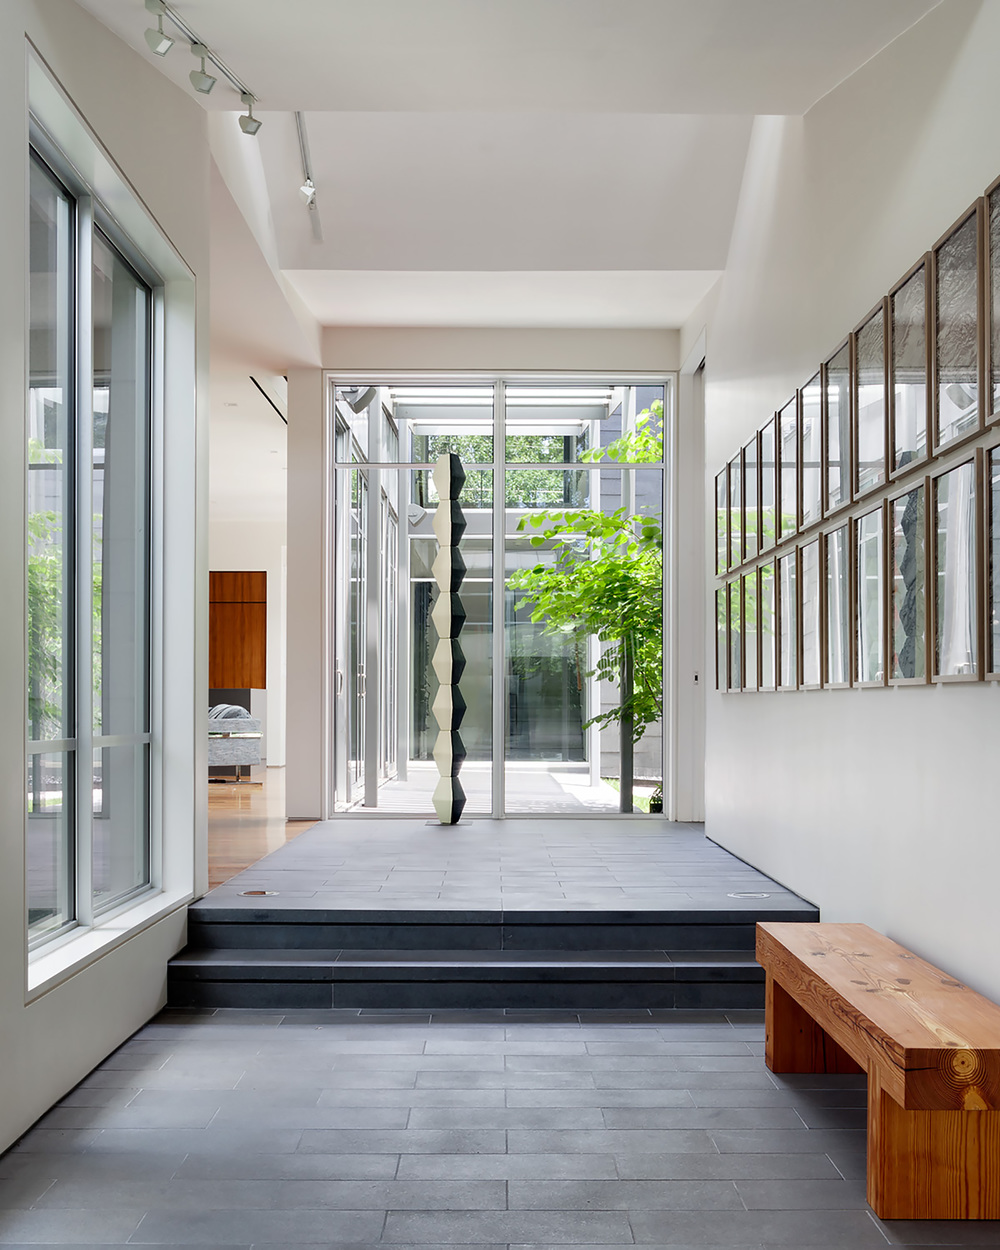 DuBois San Antonio Residnece Art Hallway.jpg